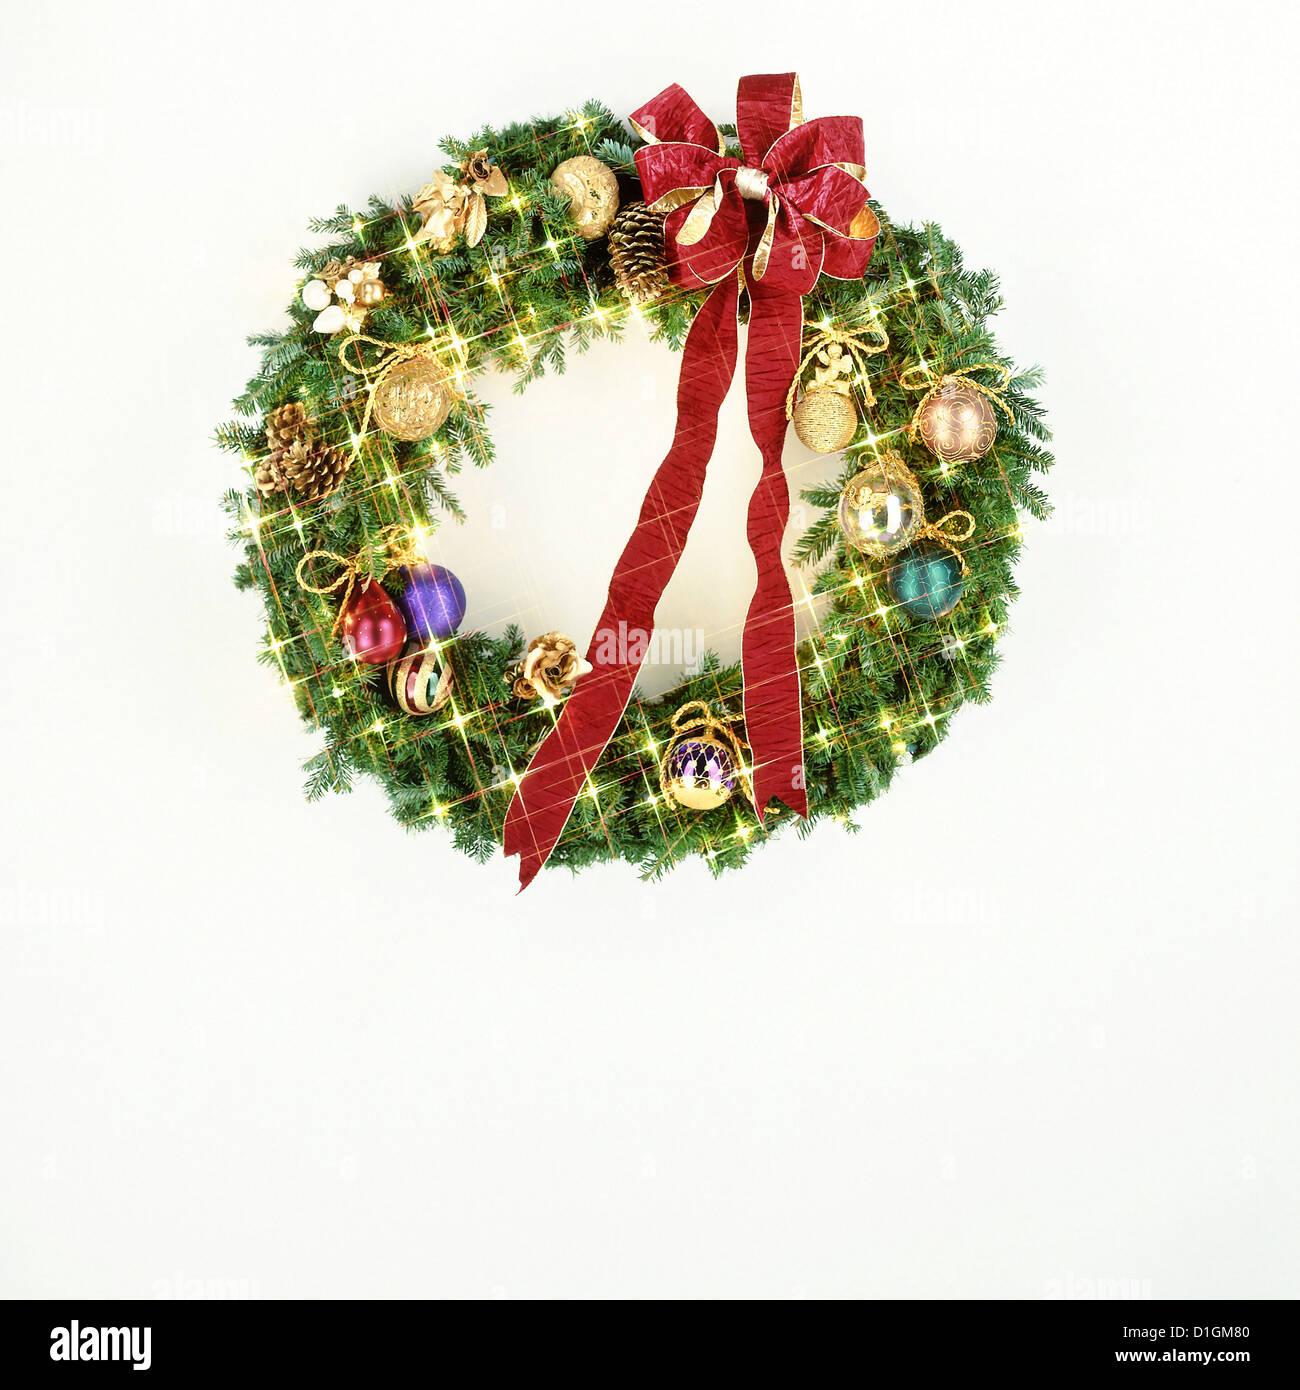 Christmas Wreath Isolated On White Background Stock Photo 52612896